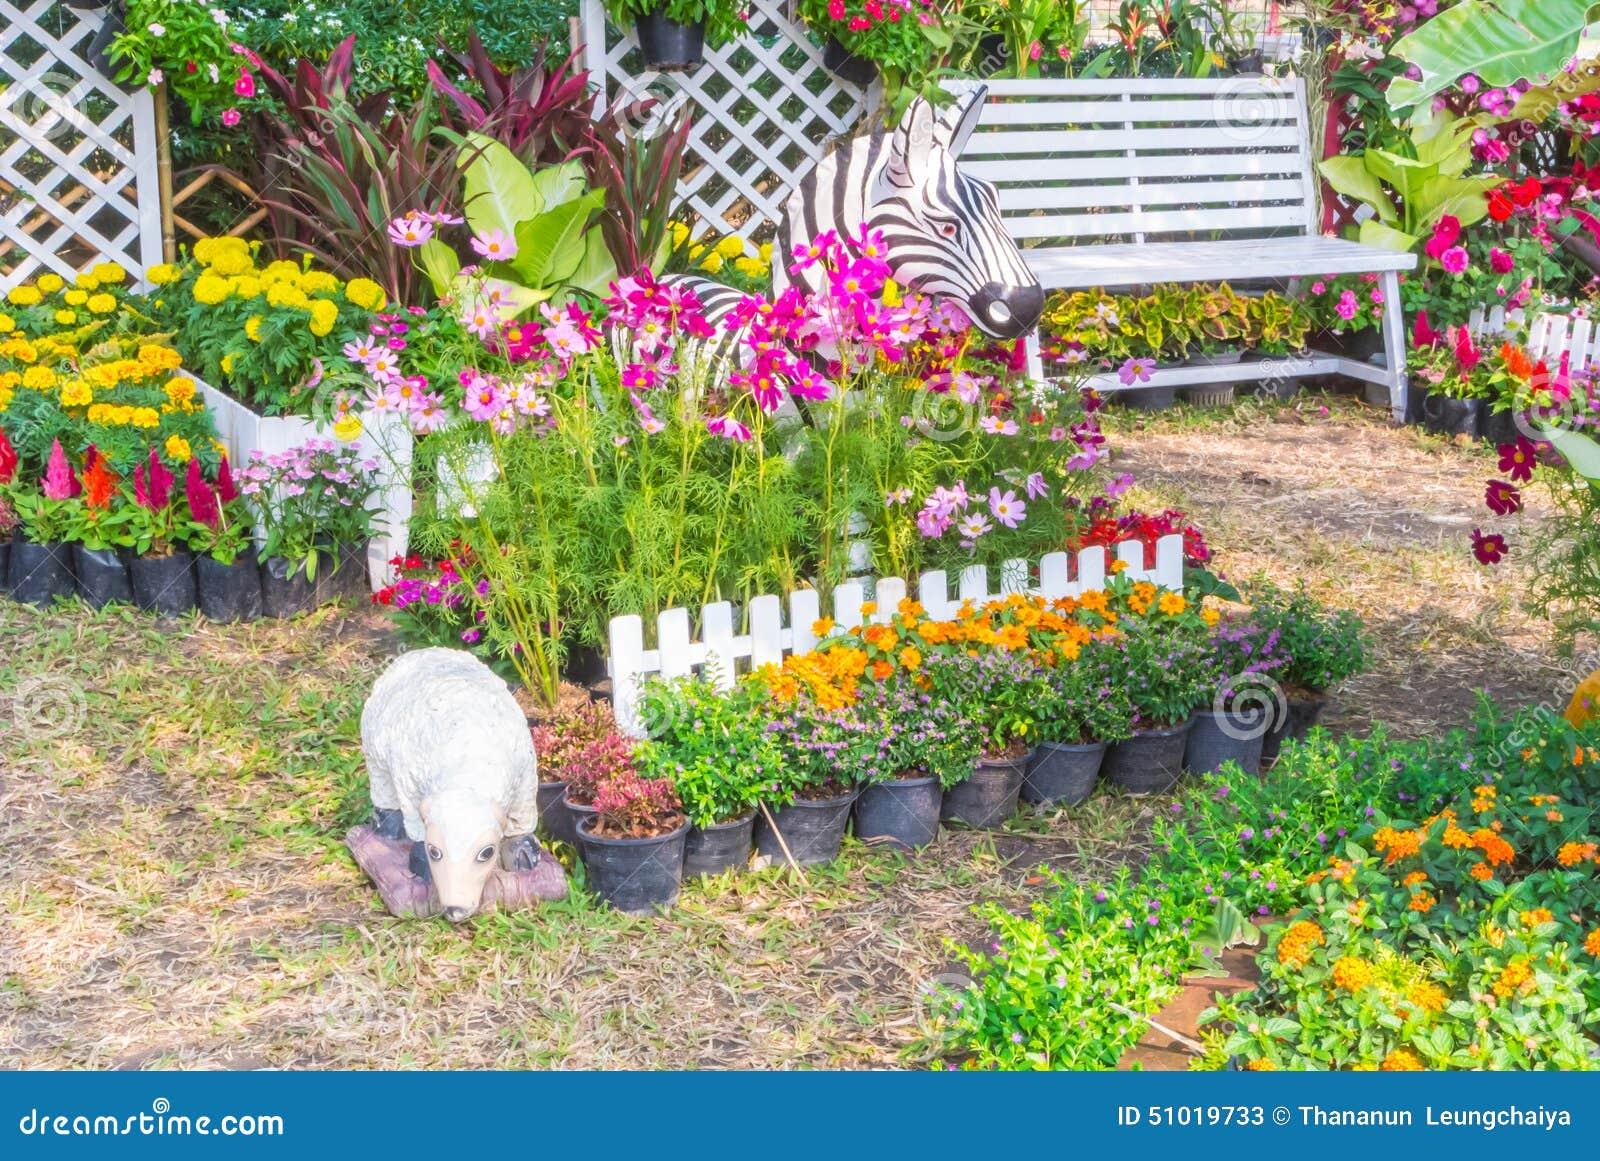 beautiful flower garden. stock image. image of ecology - 51019733